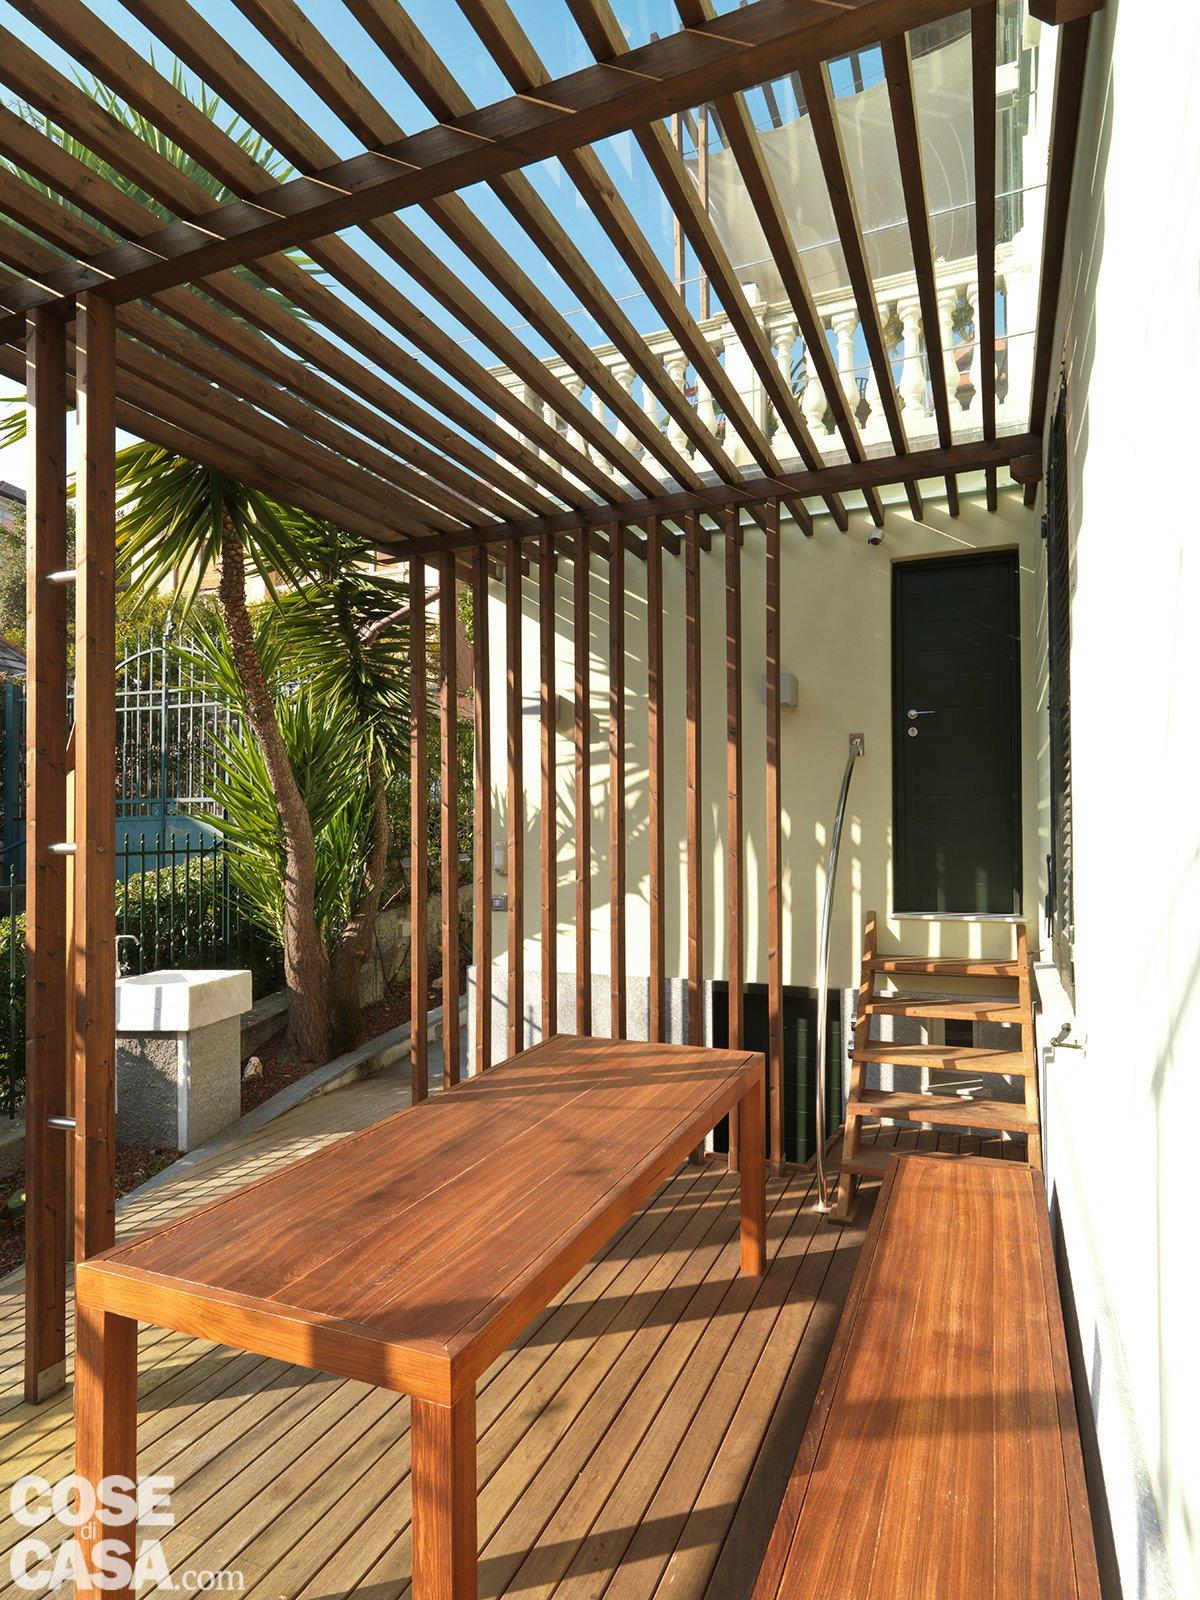 Casa soluzioni hi tech per interni anni 39 30 cose di casa for Soluzioni per ingresso casa